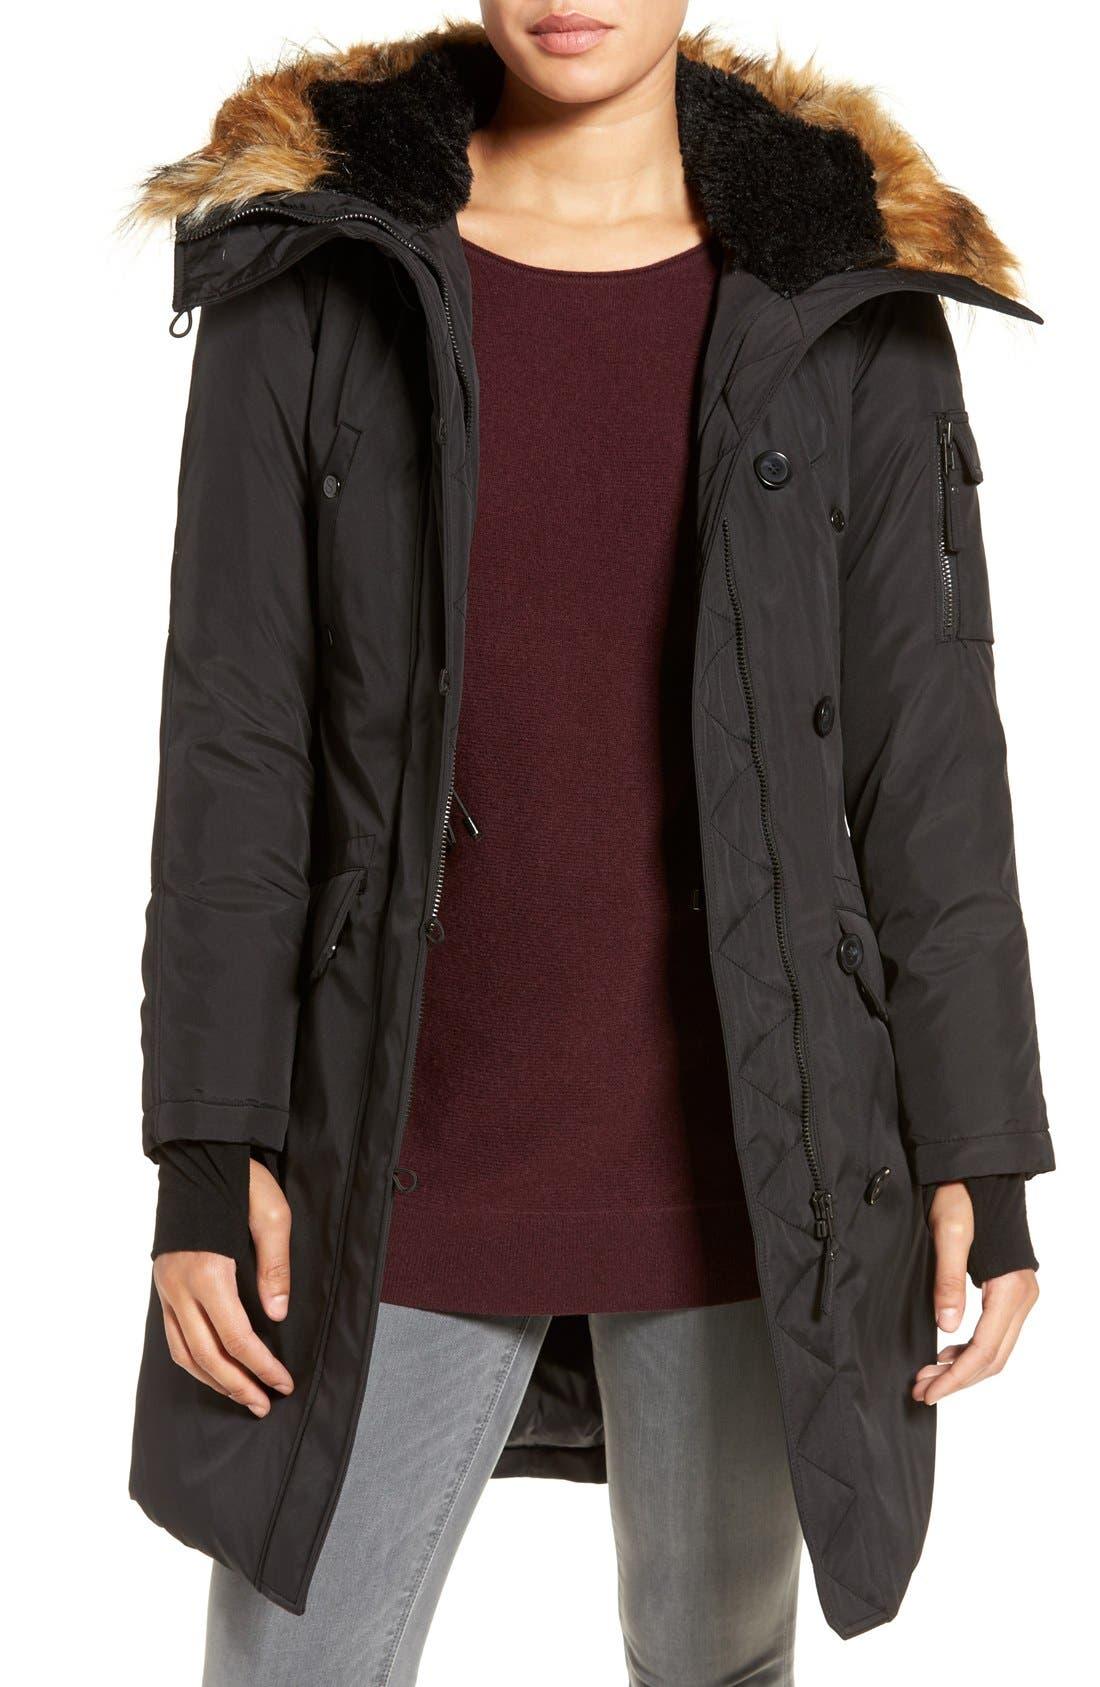 Alternate Image 1 Selected - S13 'Alaska' Parka with Faux Fur Trim Hood